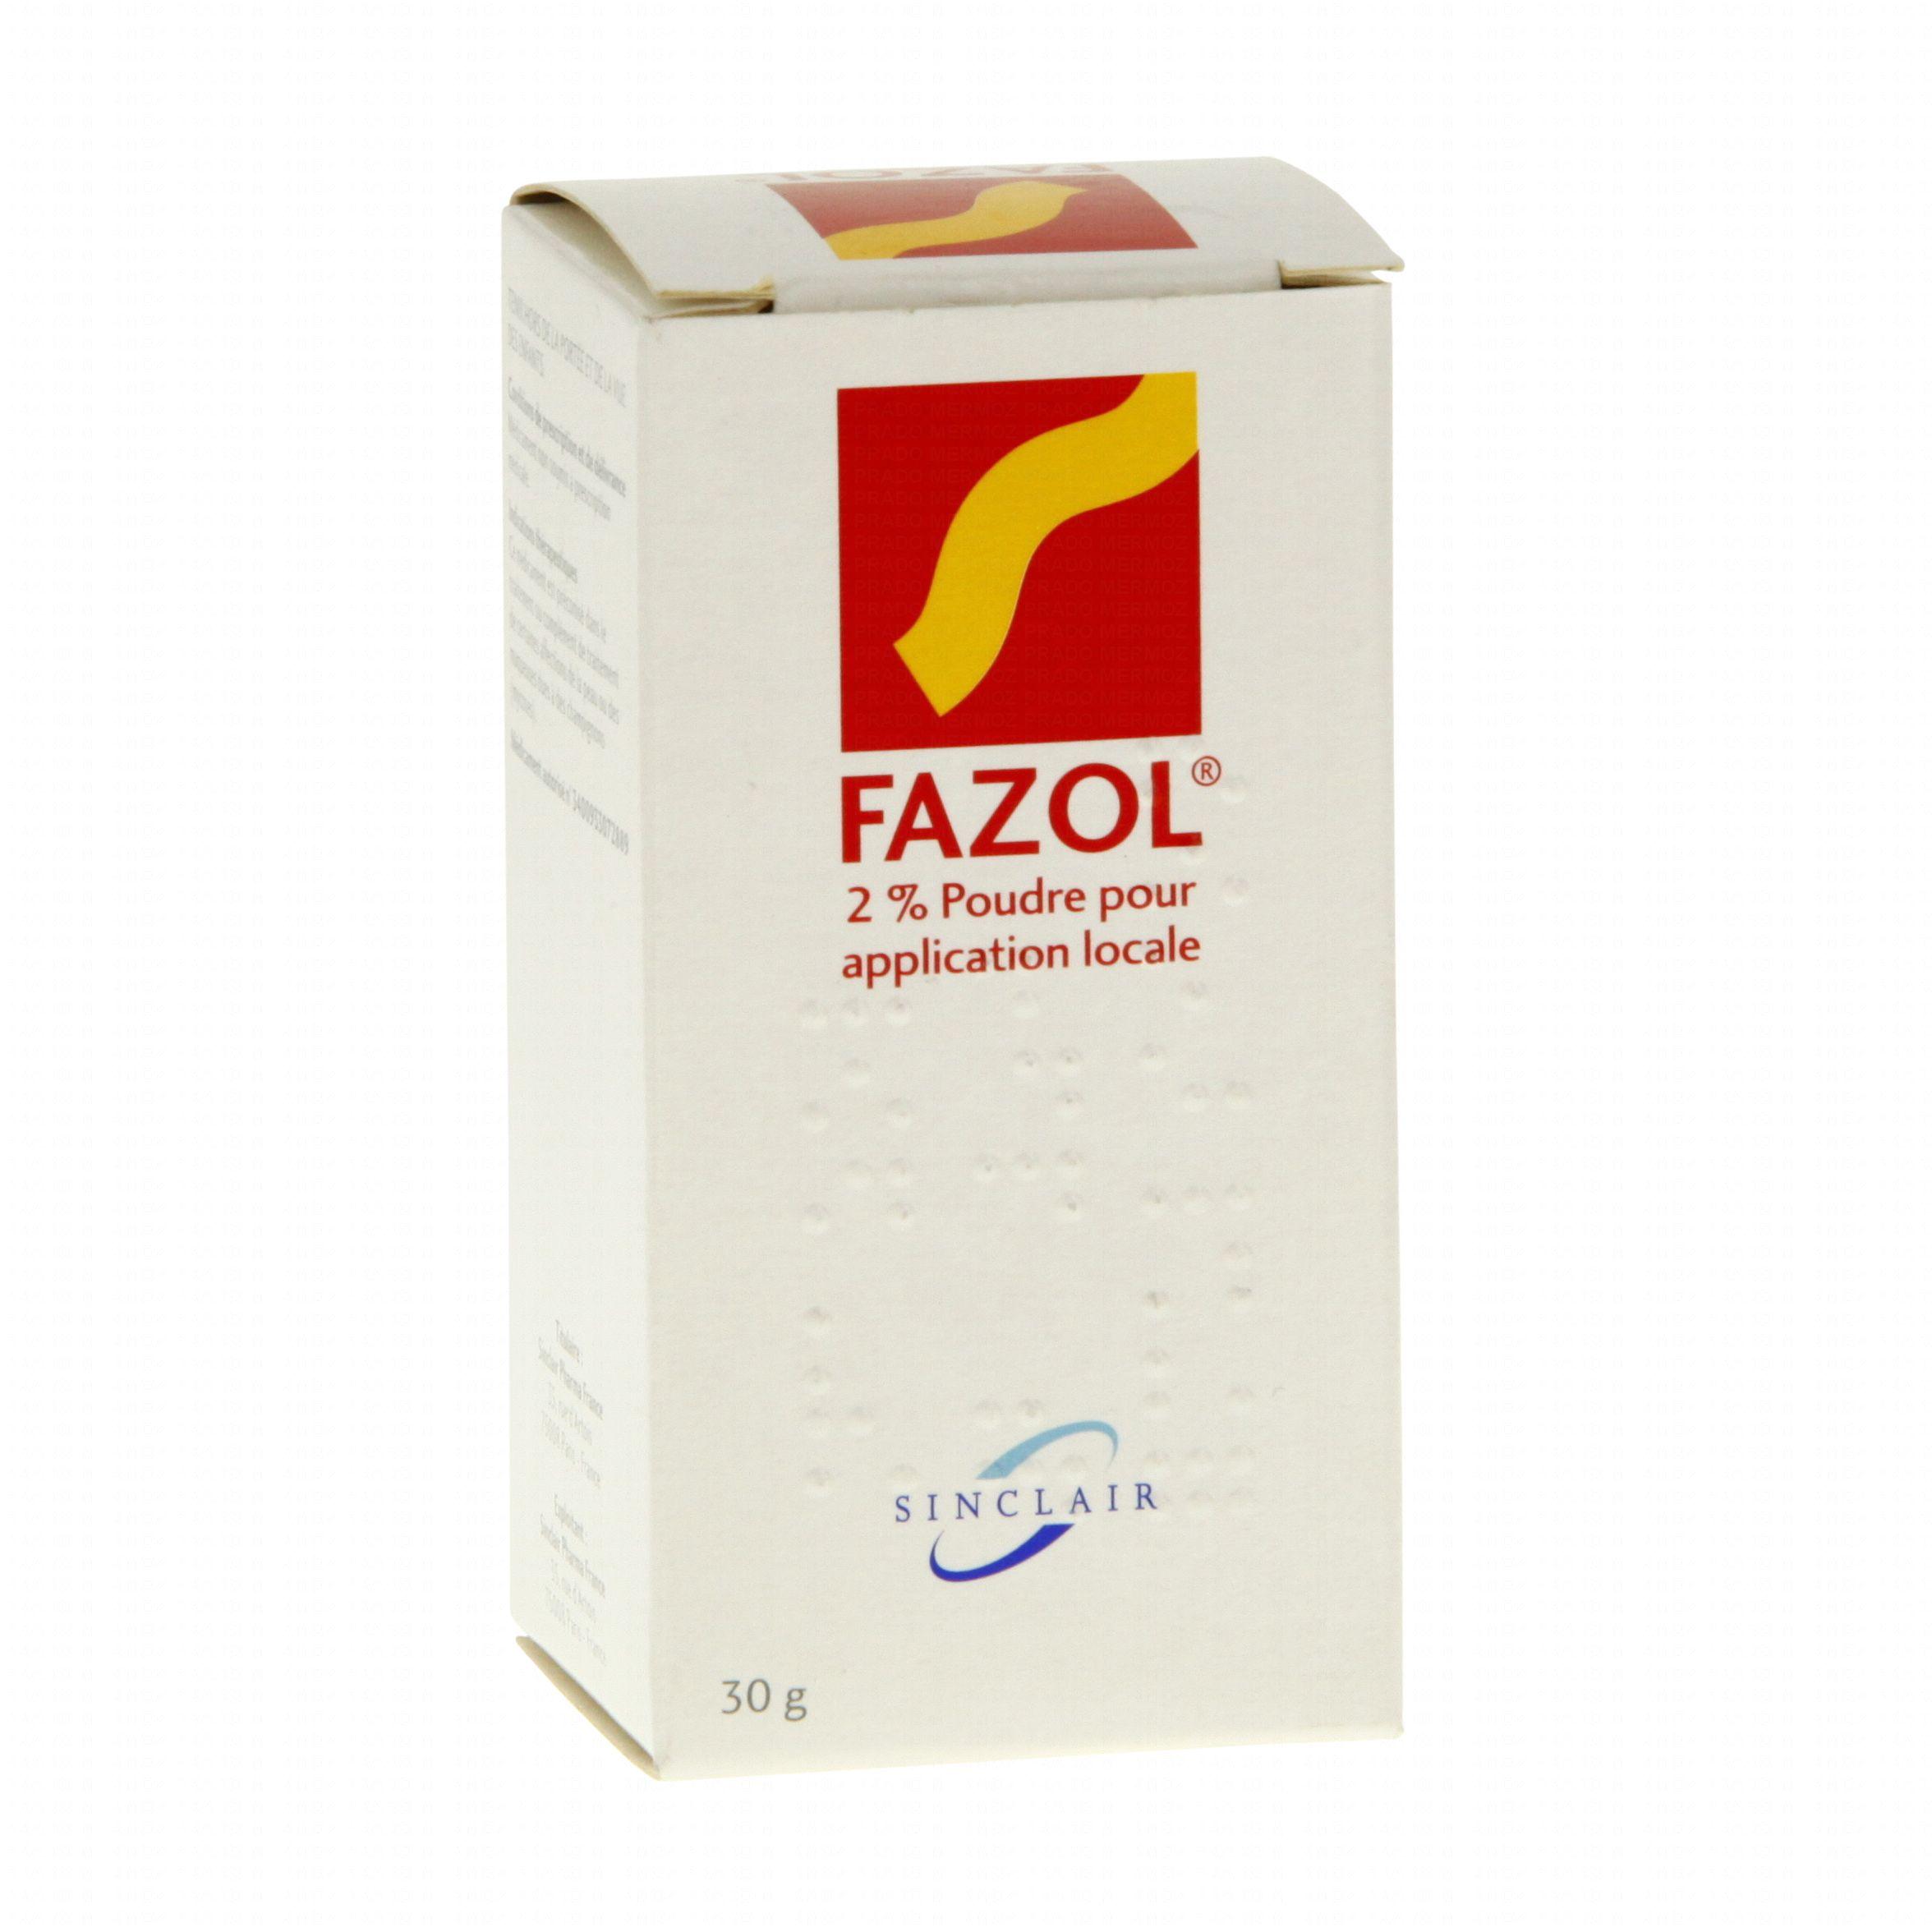 Aldara Imiquimod Prix - Dapoxetine 60 mg price